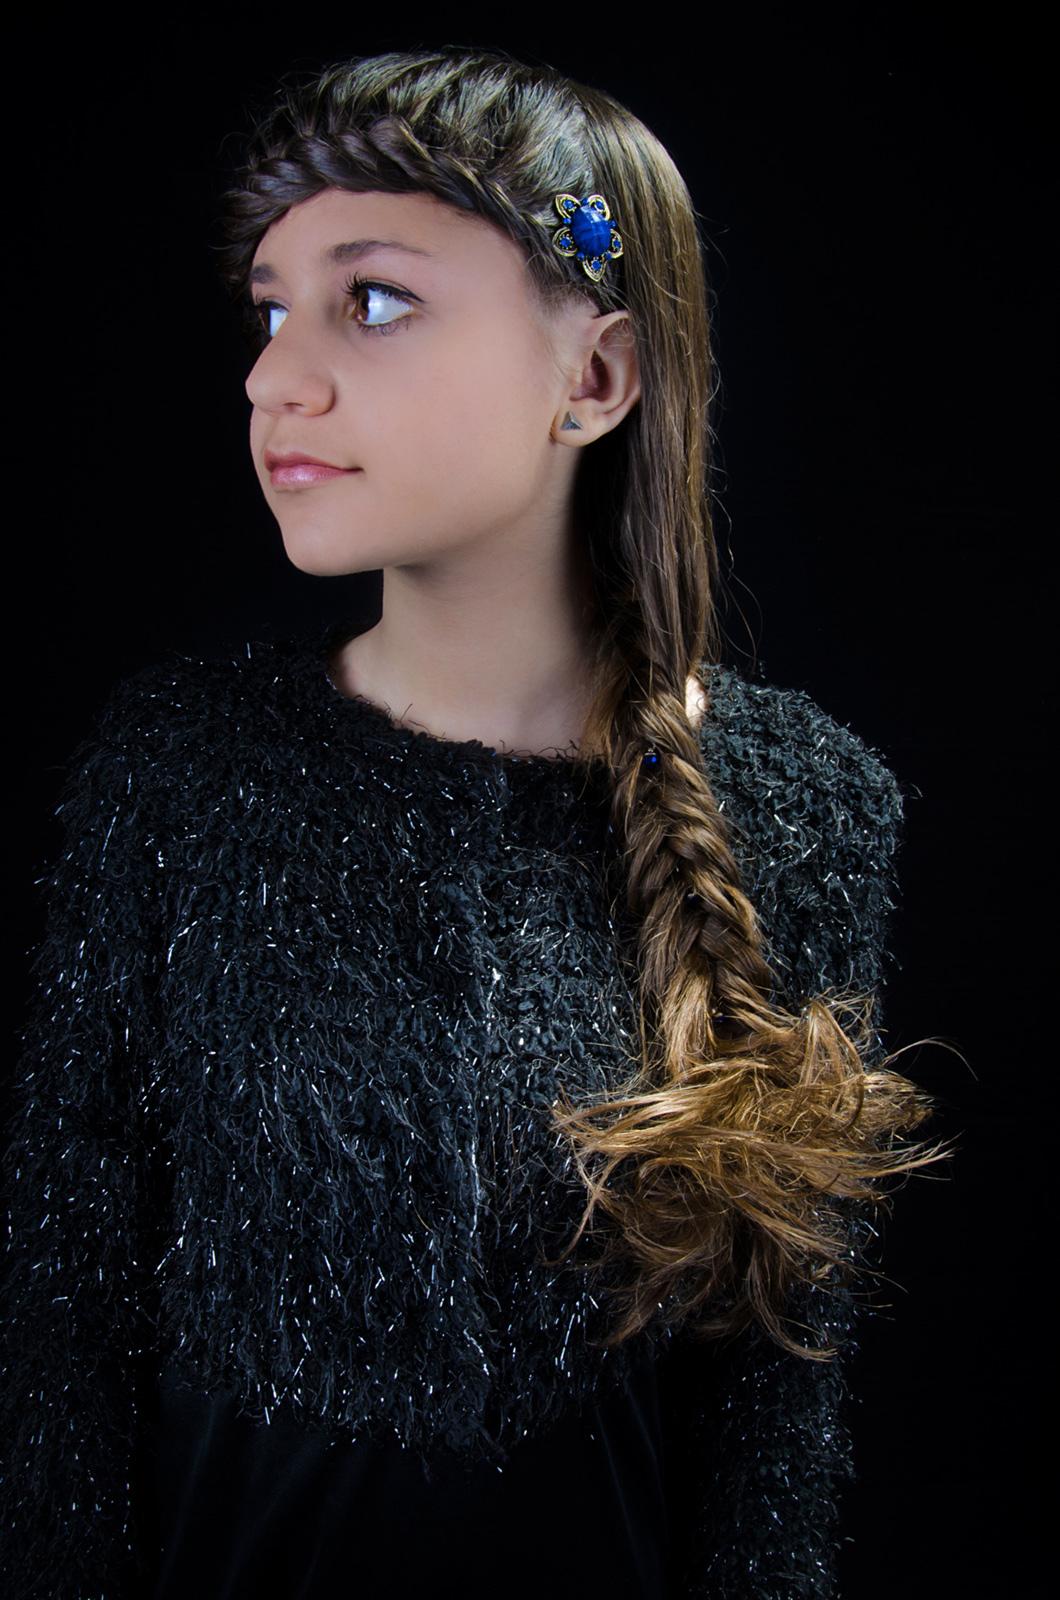 immagine_donna_parrucchieri_torregrotta_messina_estetista_parrucchiere_uomo-donna_cosmetici_salone_valeria11